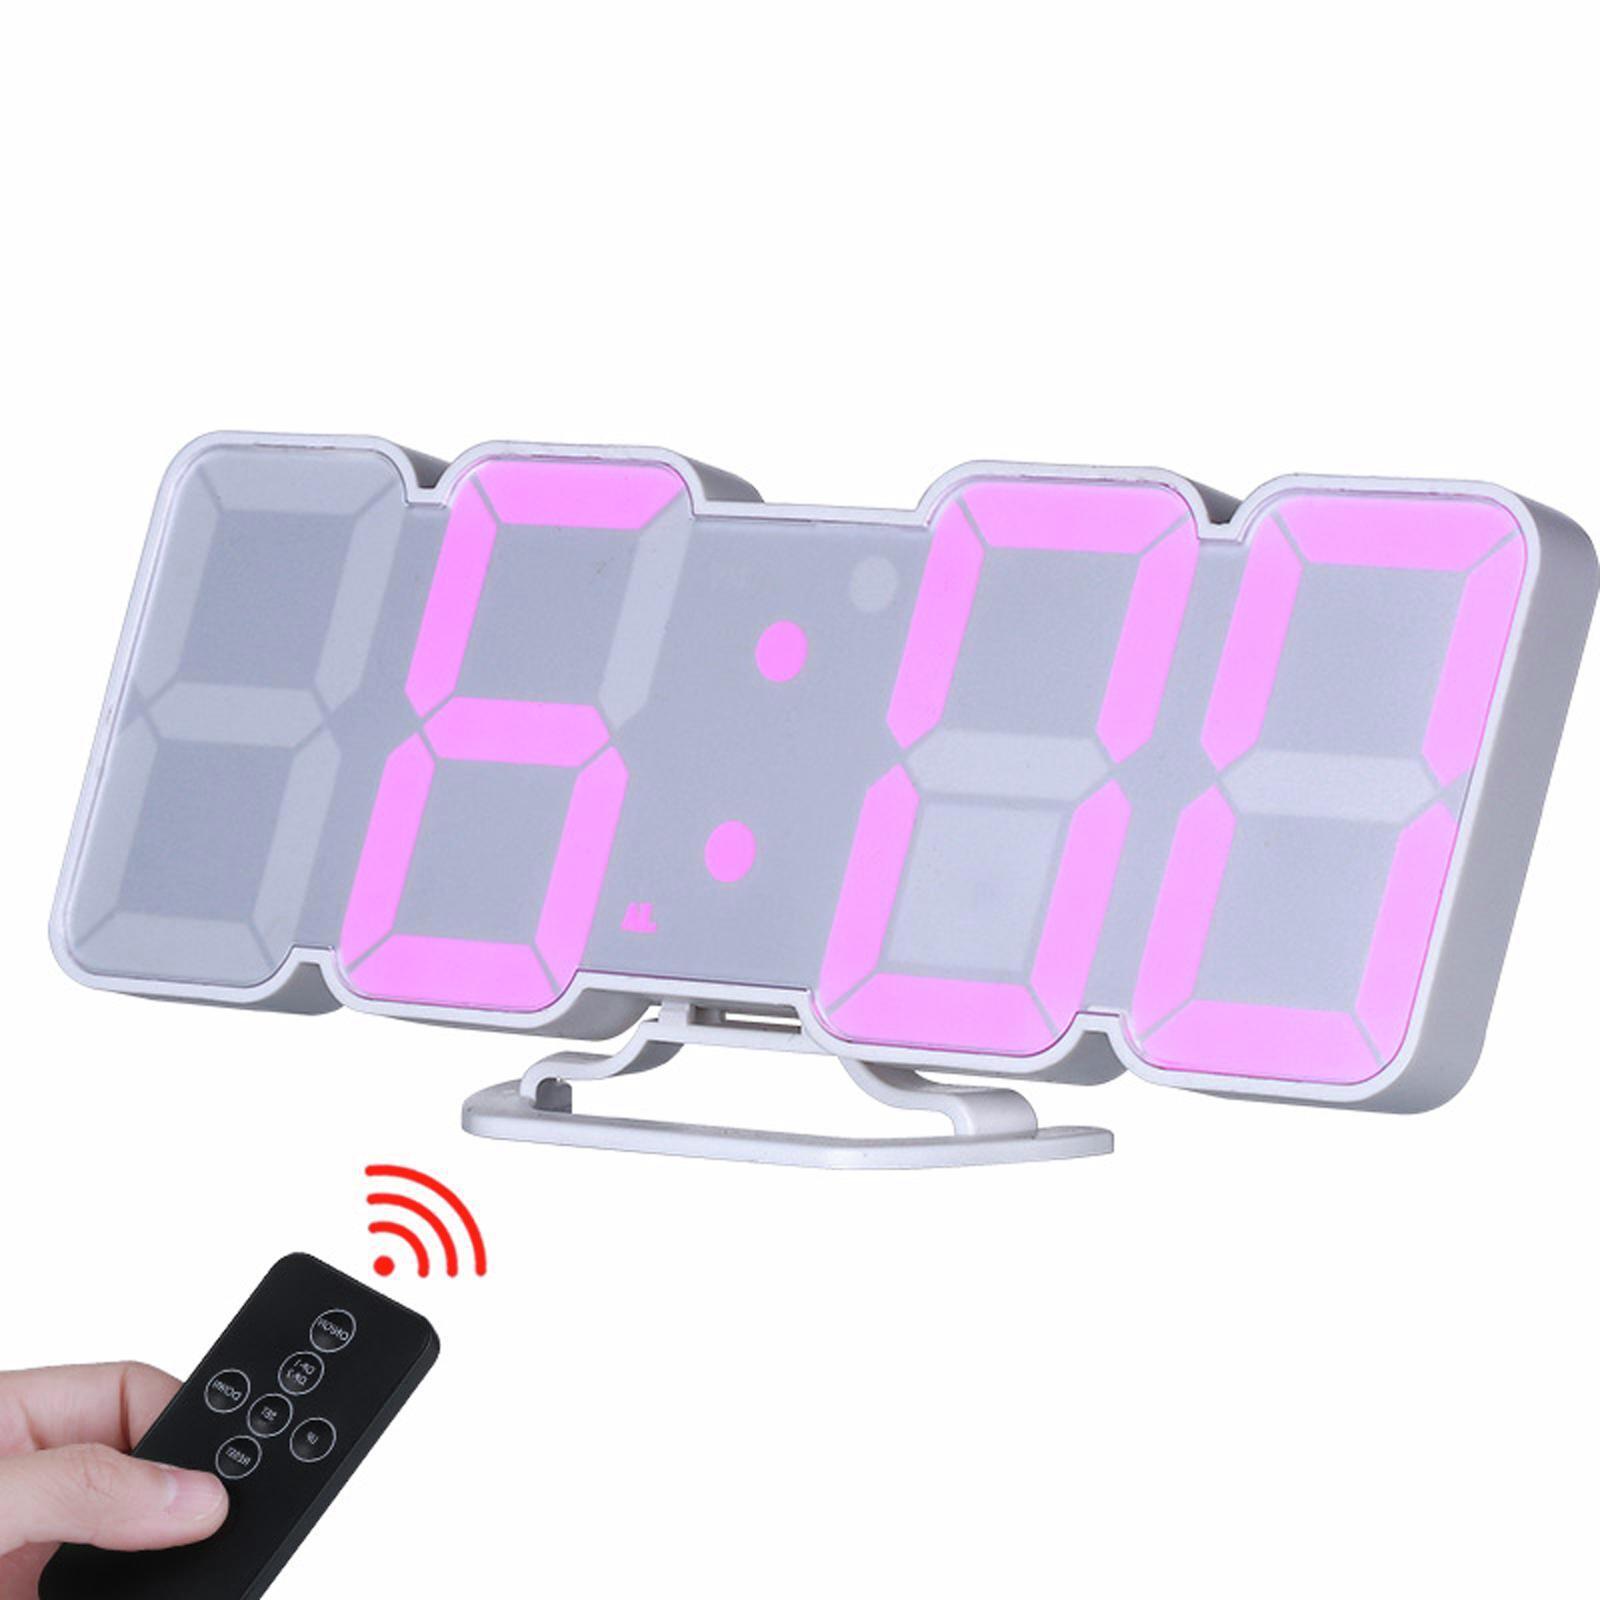 TODO LED Digital Alarm Clock Countdown Timer w/ Remote Control - White